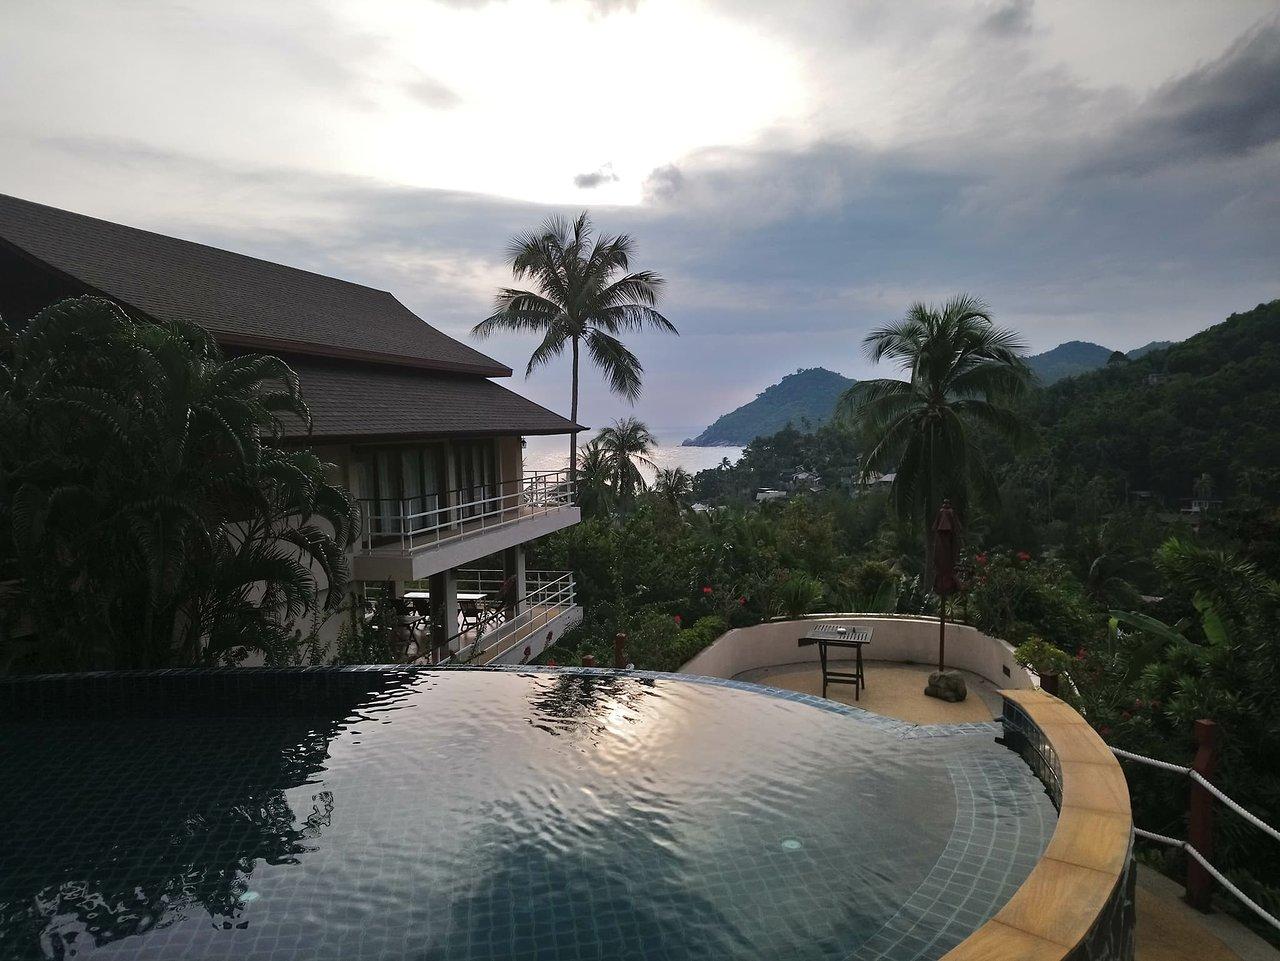 koh phangan pavilions 43 5 2 updated 2019 prices villa rh tripadvisor com